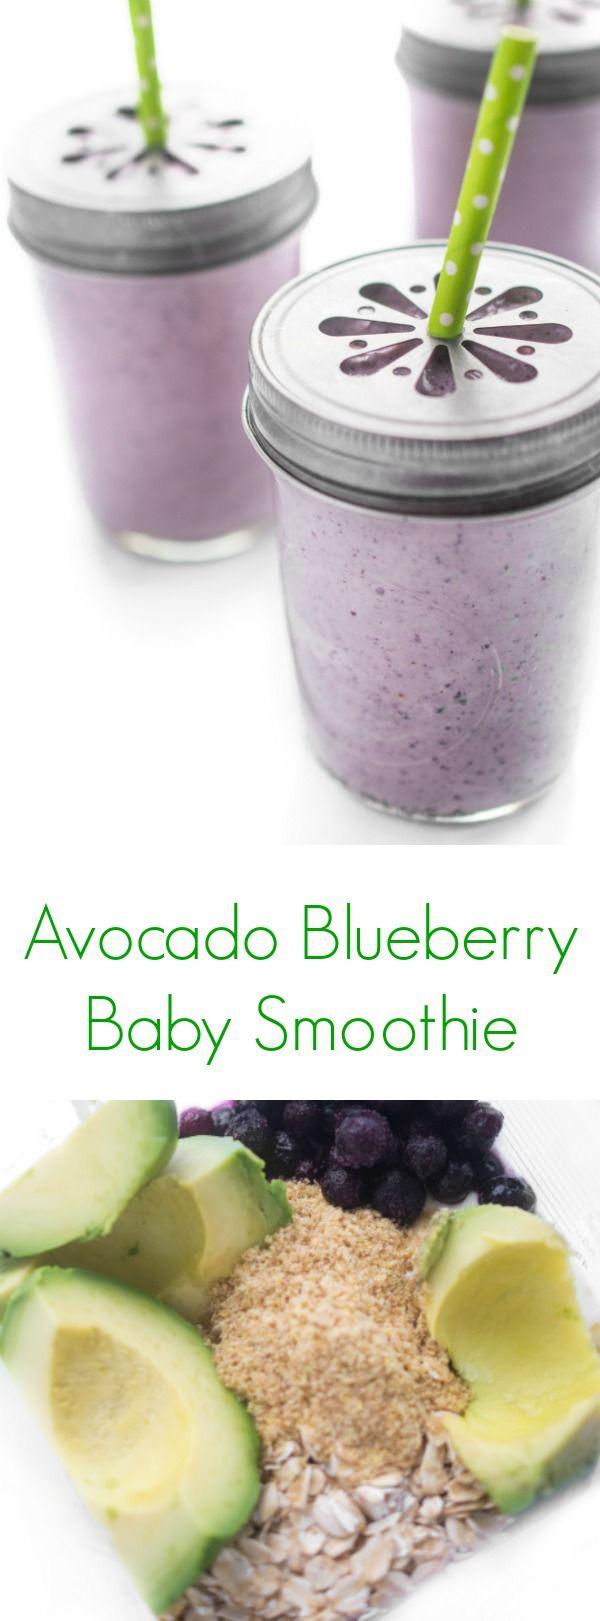 Avocado Blueberry Baby Smoothie - The Lemon Bowl®